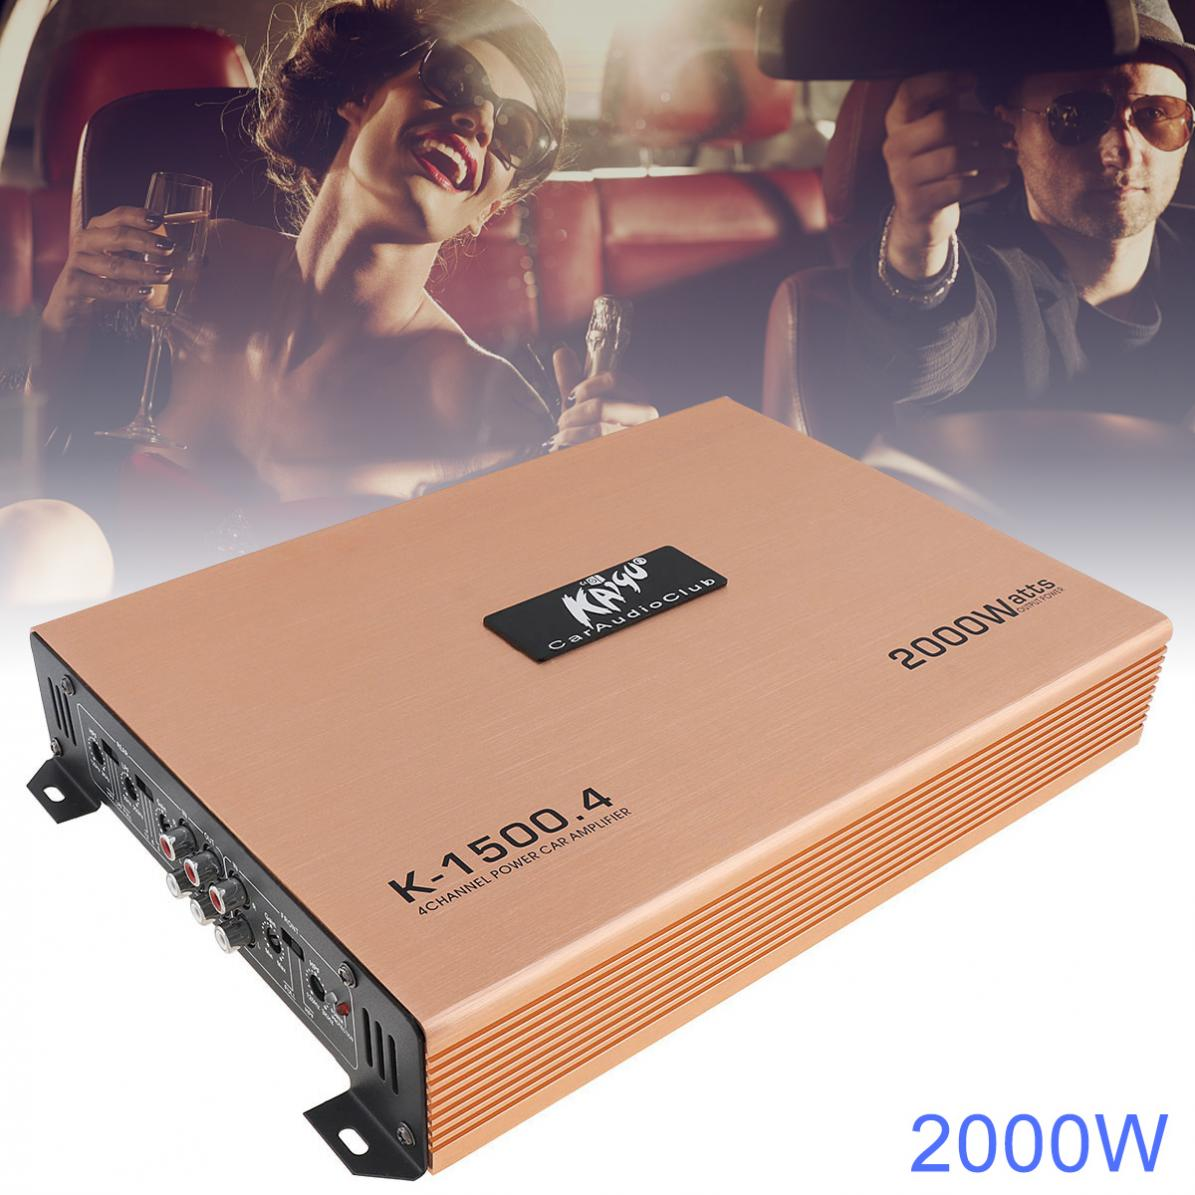 Amplificadores estéreo para coche de alta potencia 2000W Clase AB Digital 4 canales de aleación de aluminio para coche/hogar